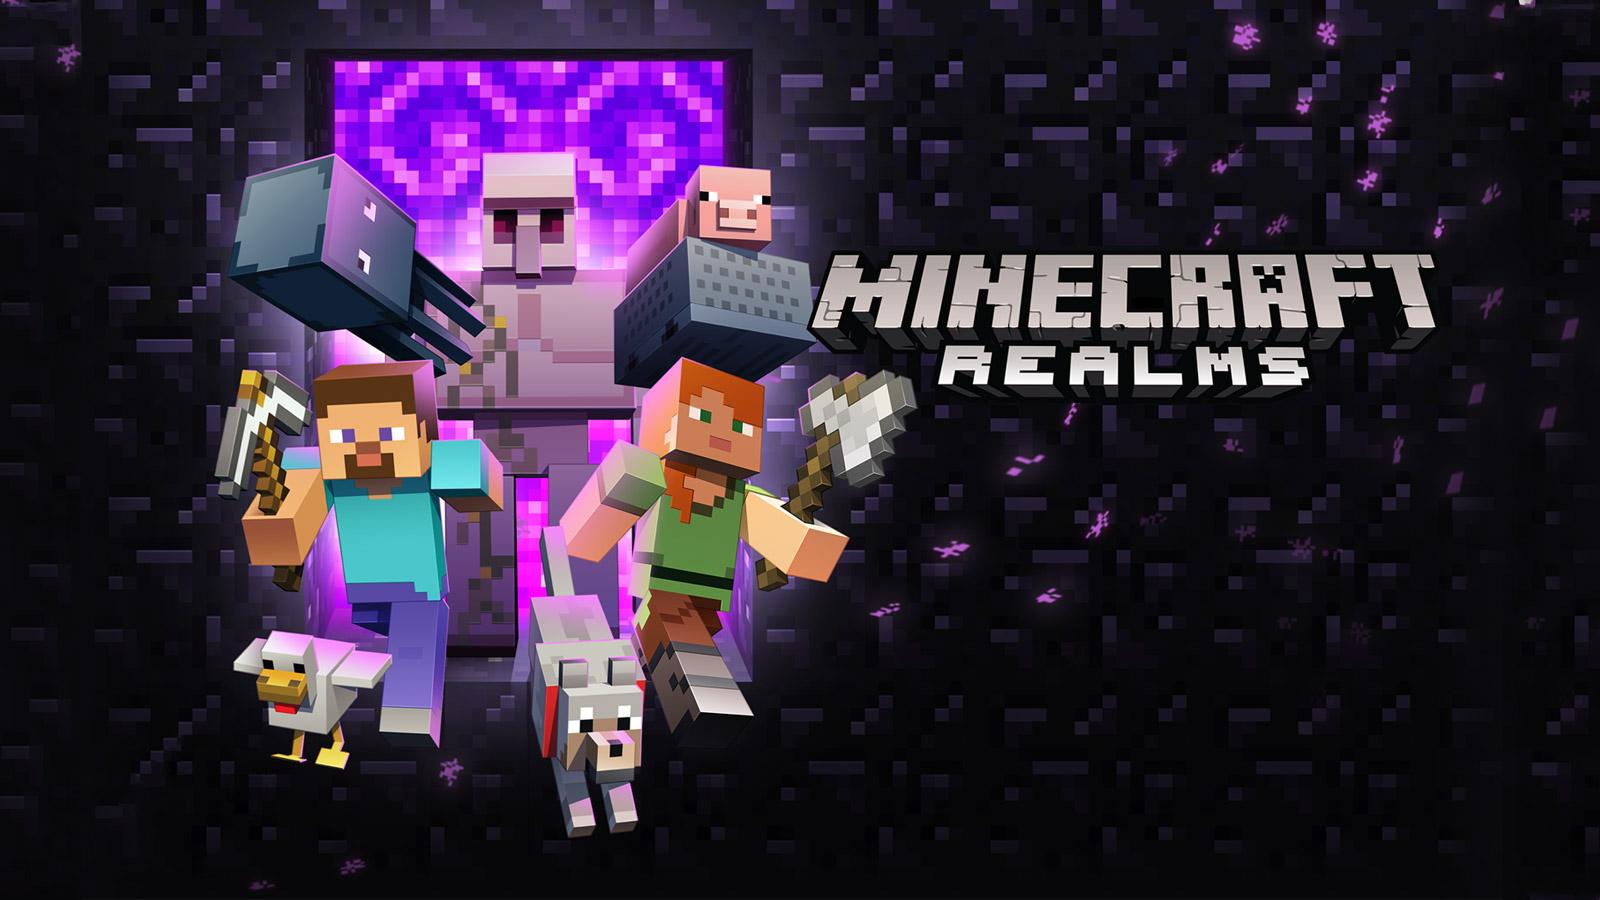 Free Minecraft Wallpaper in 1600x900